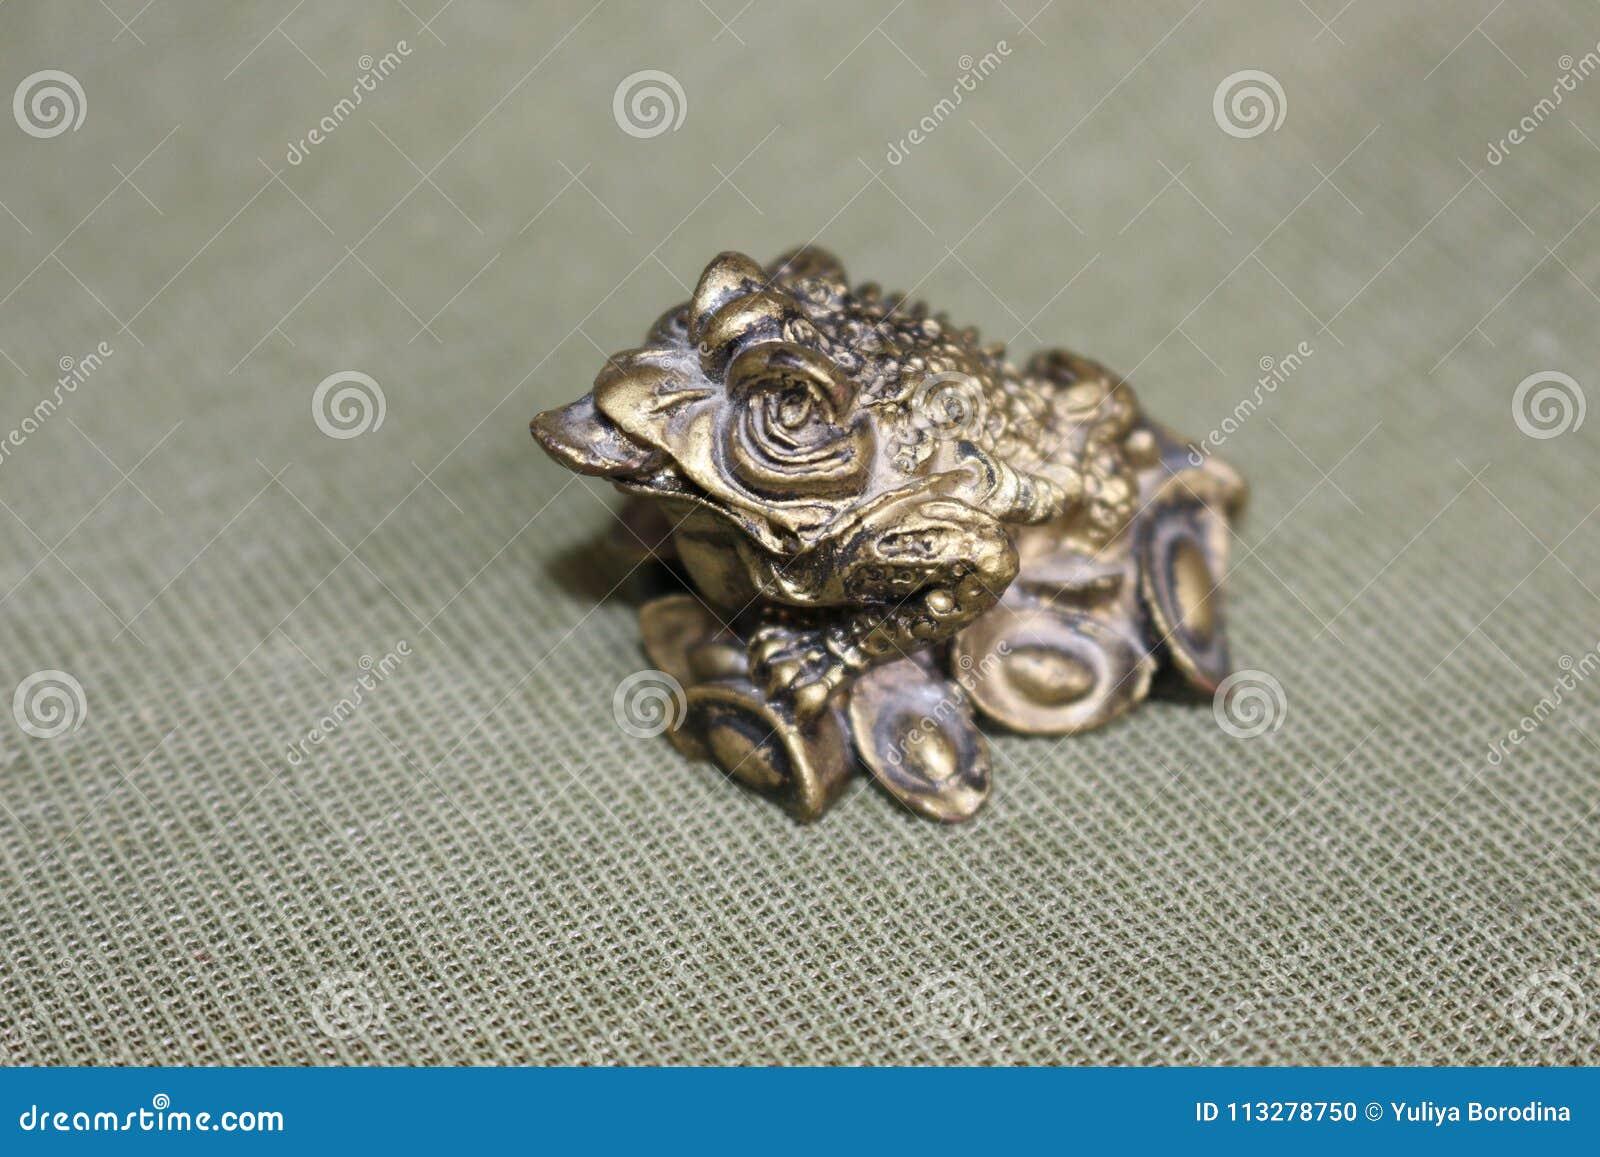 Символ лягушки, принося деньги, процветание